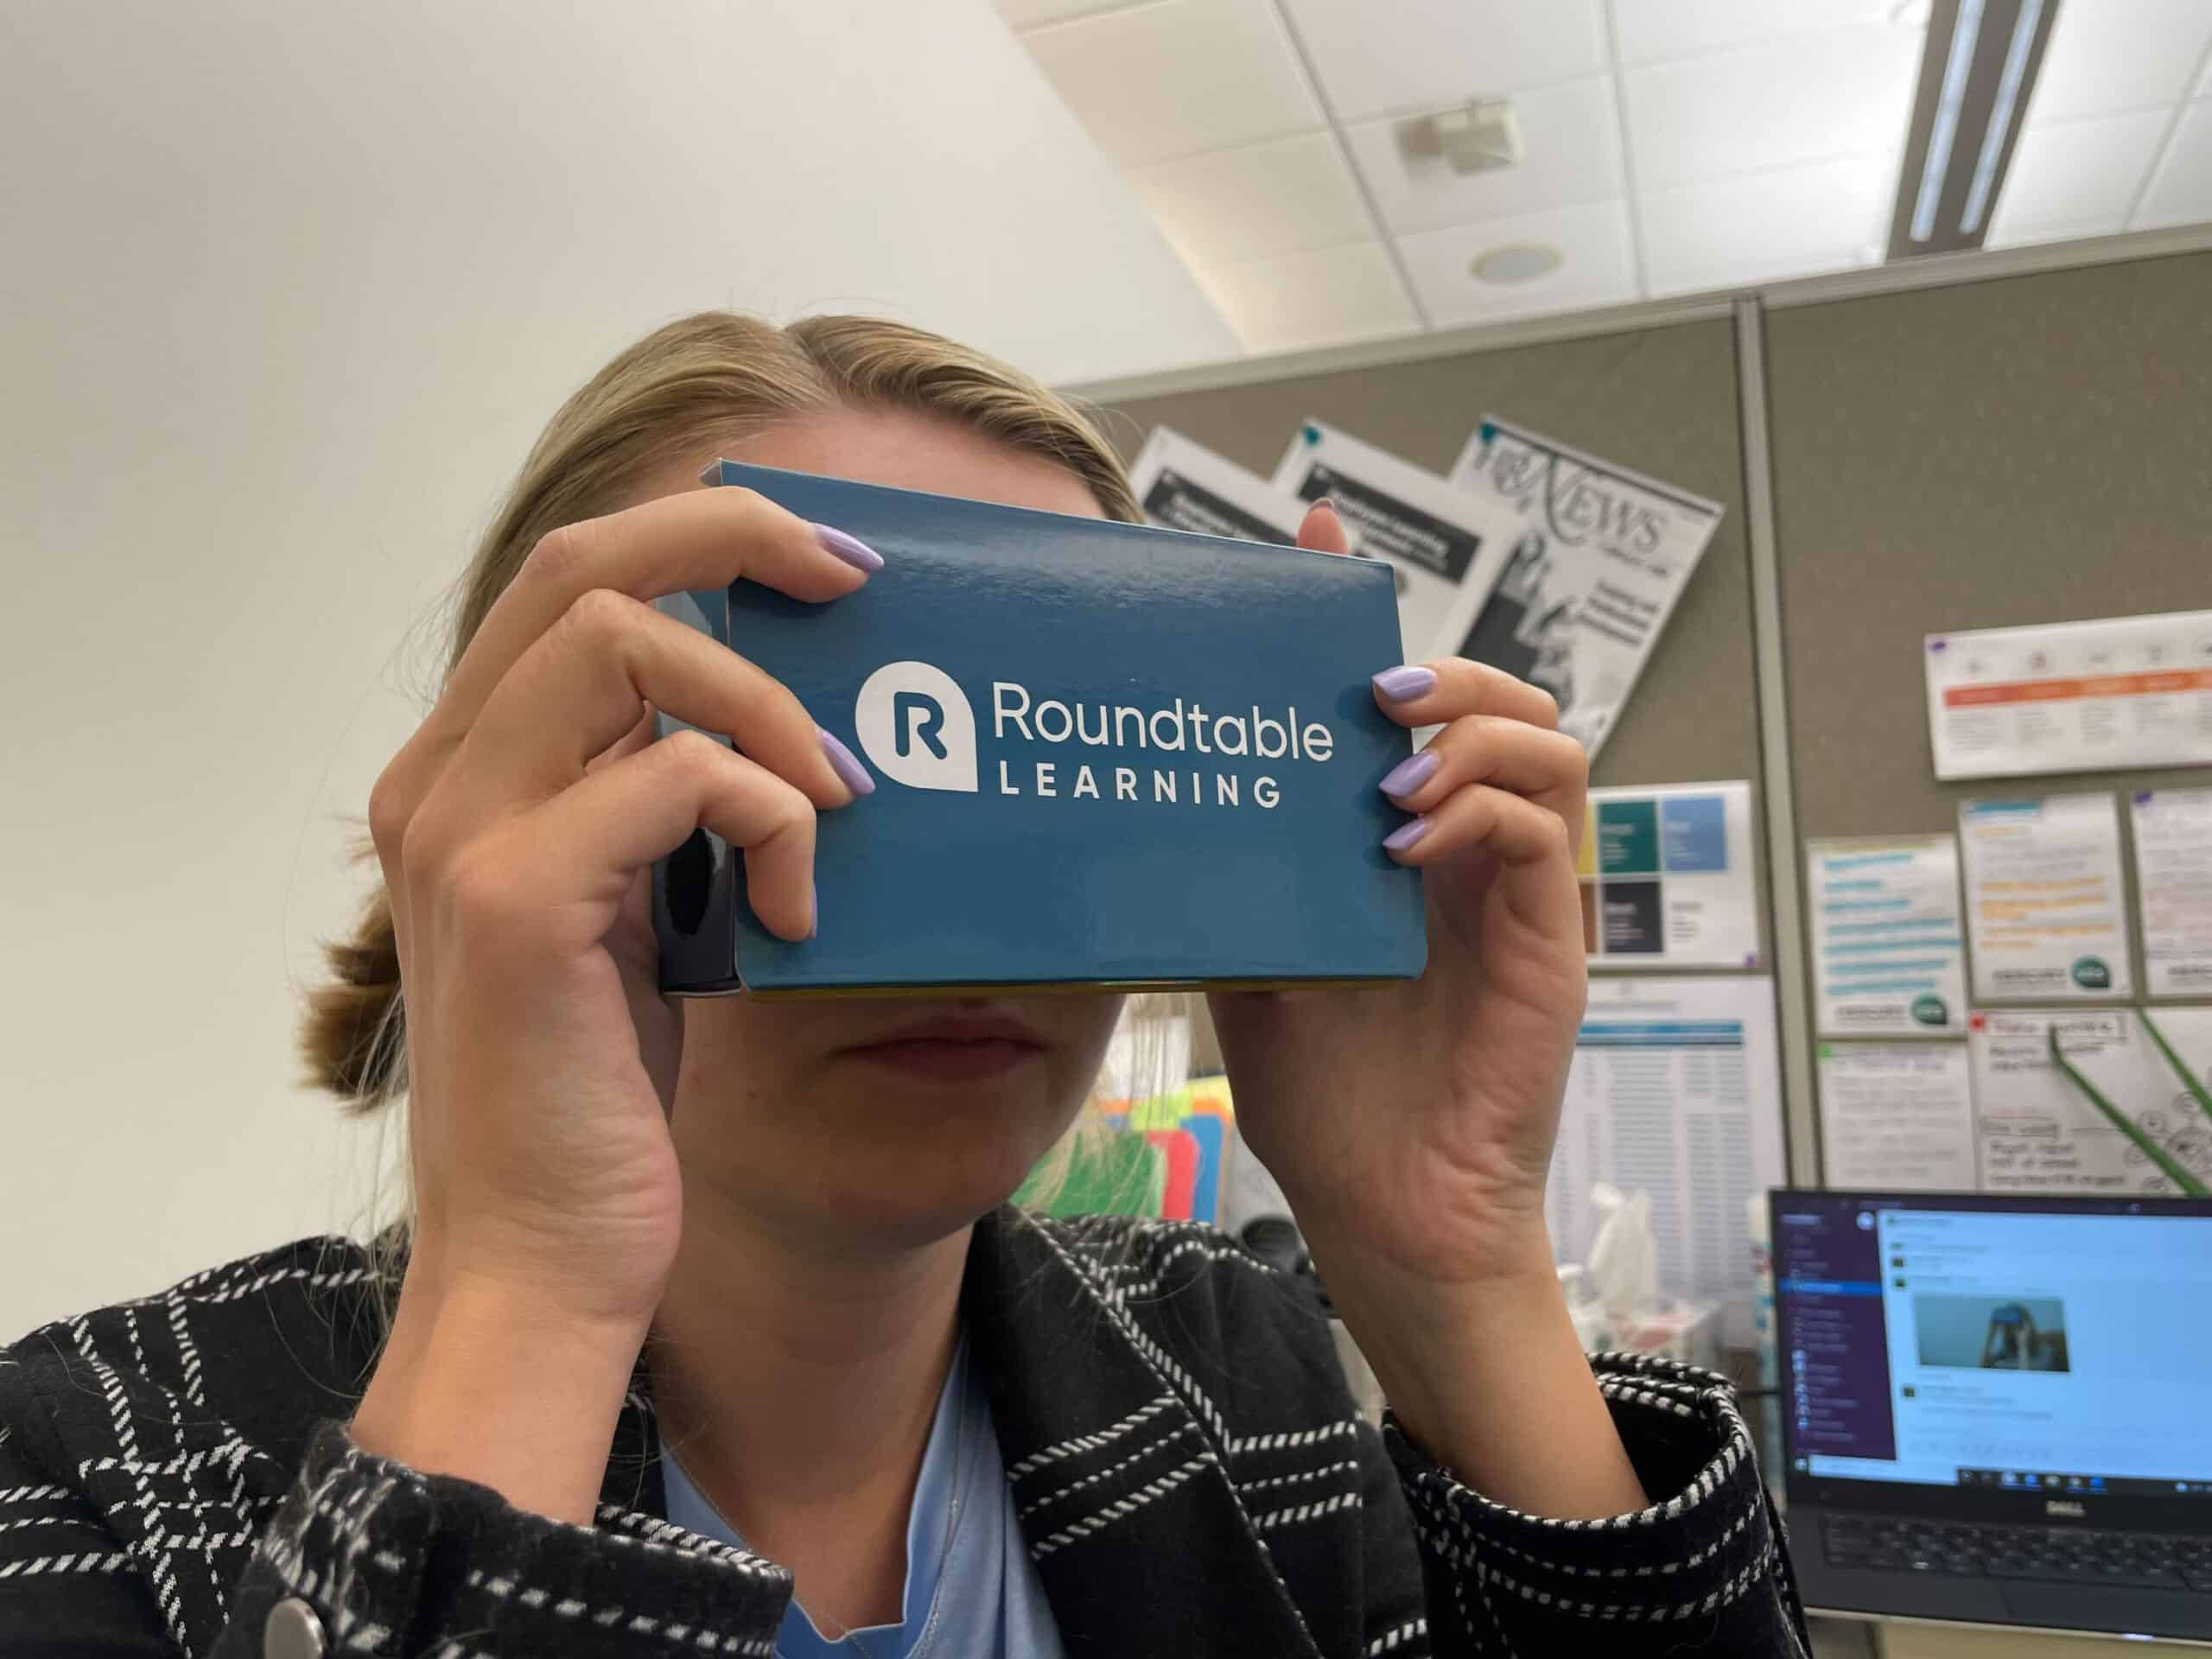 cardboard virtual reality headset